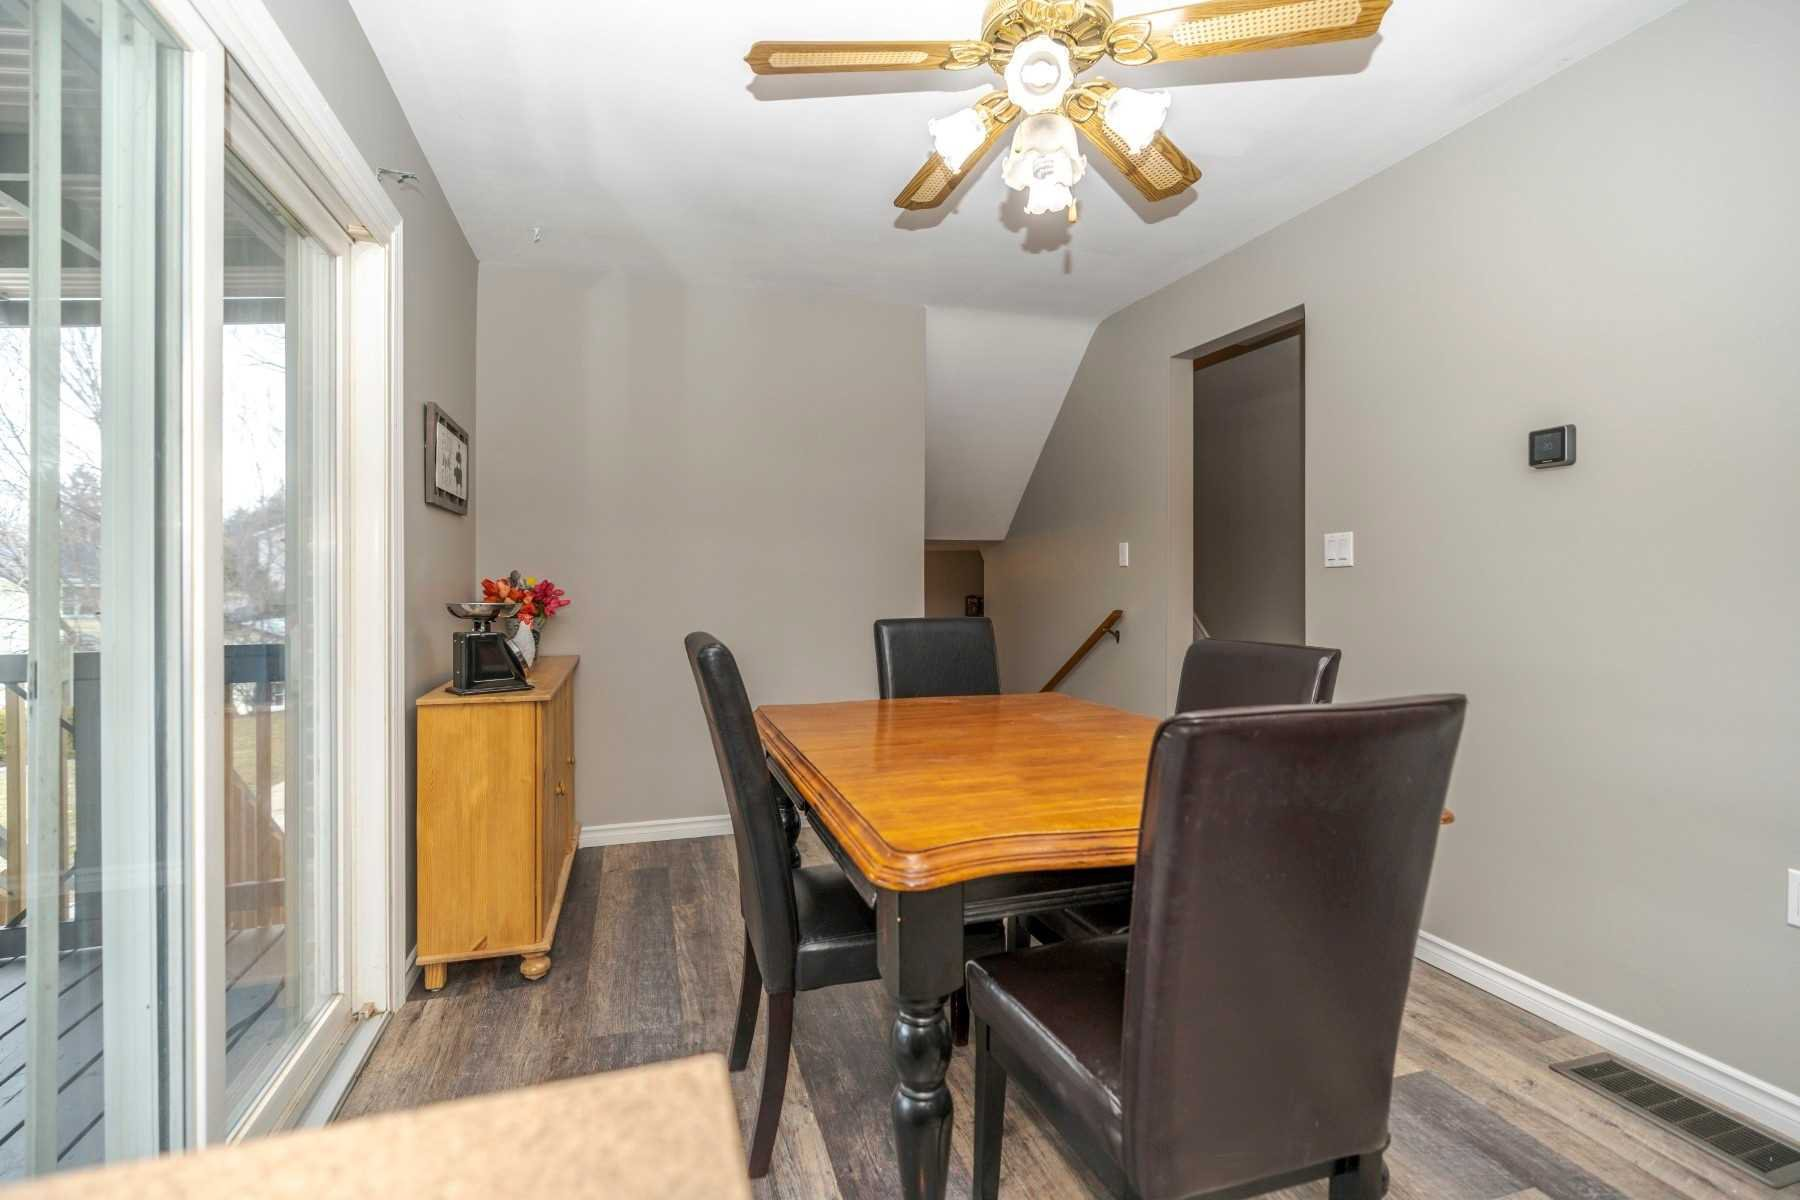 Photo 7: Photos: 190 N Church Street in Clarington: Orono House (Sidesplit 4) for sale : MLS®# E4463047